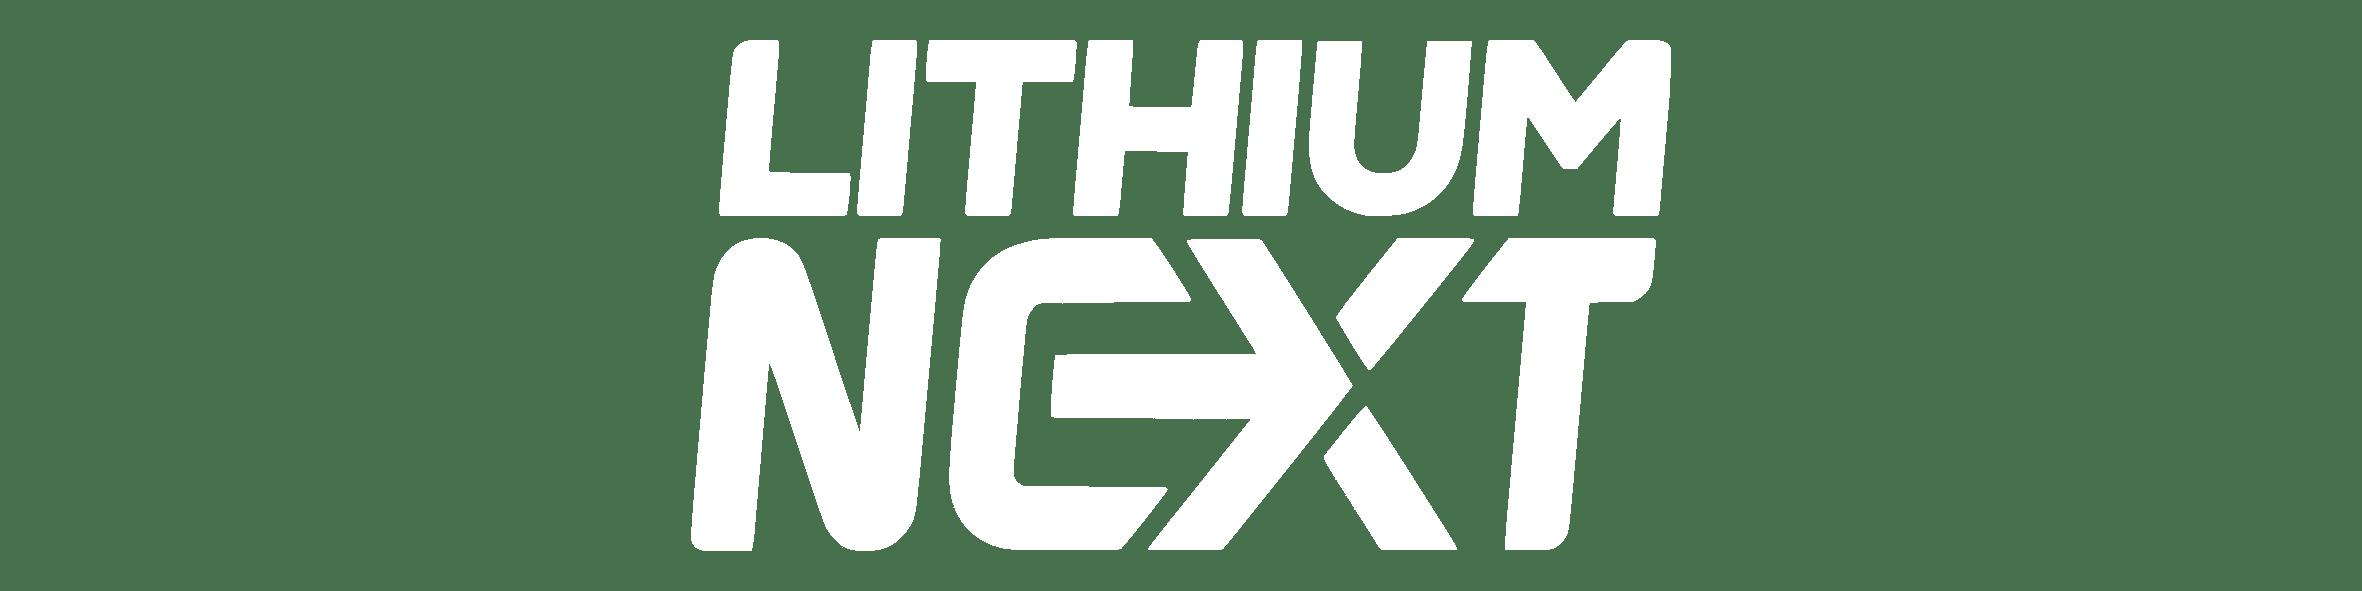 LithiumNEXT